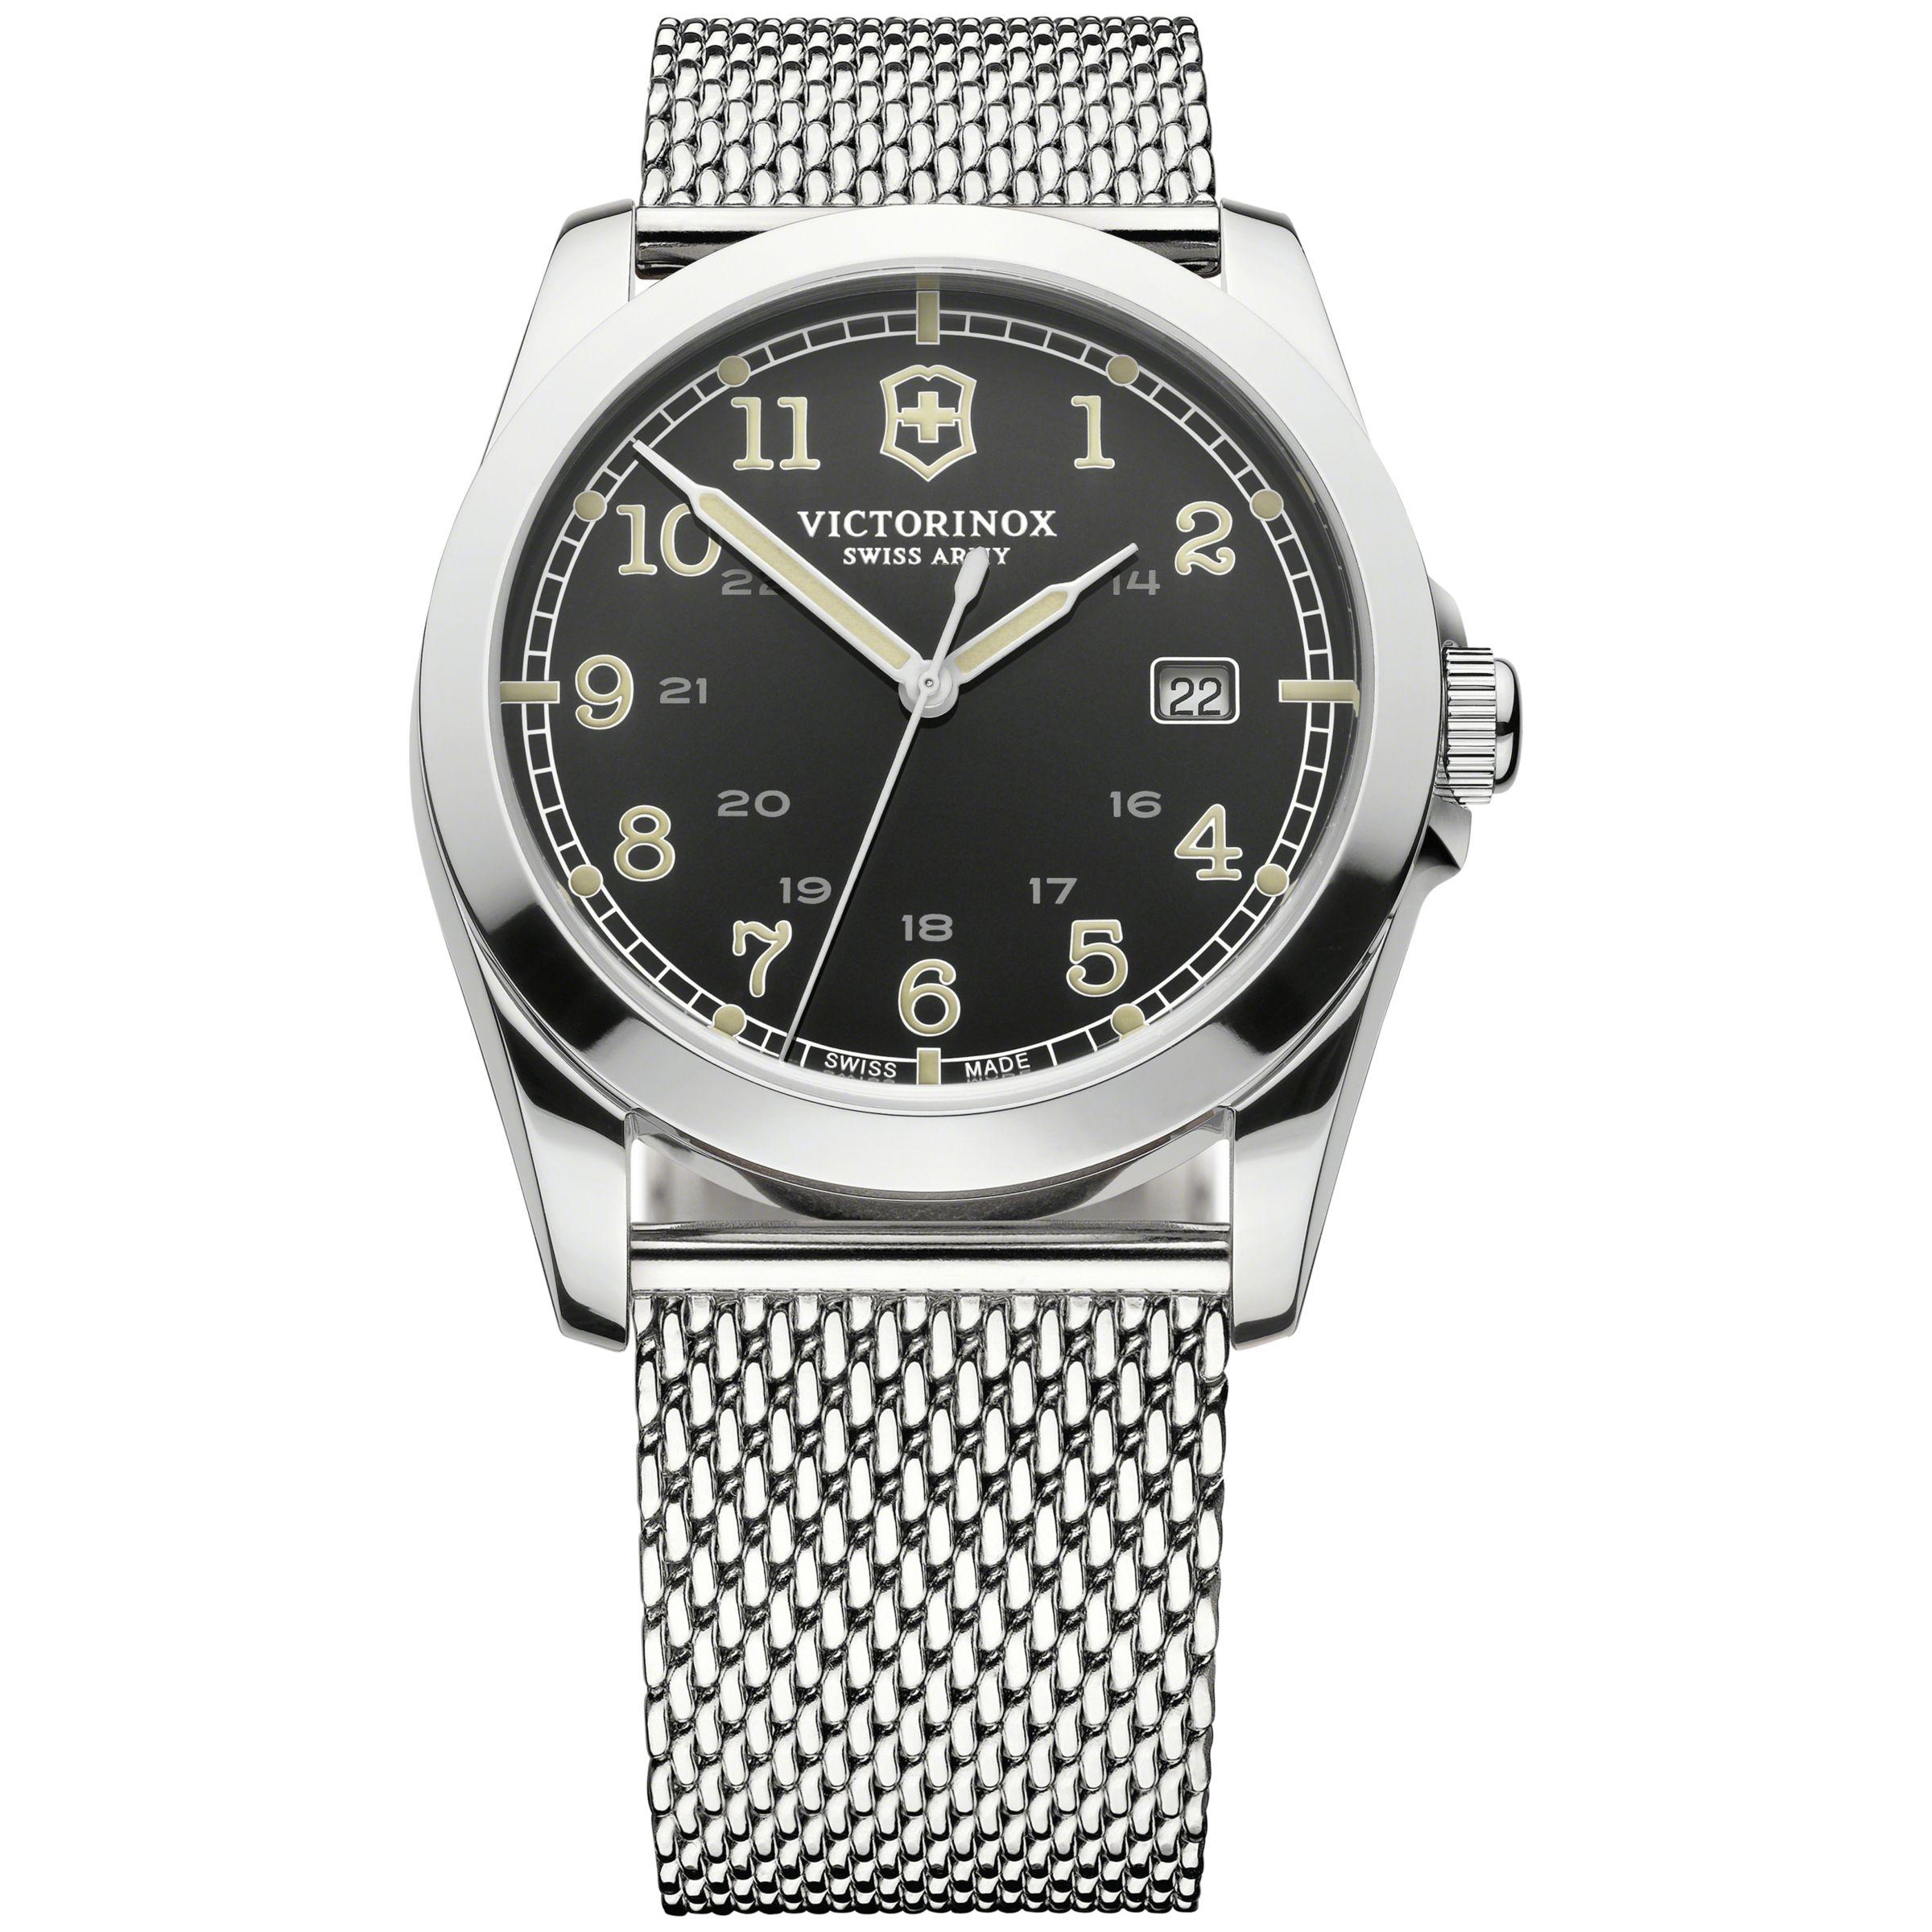 Victorinox Victorinox 241585 Men's Infantry Stainless Steel Mesh Bracelet Strap Watch, Silver/Black